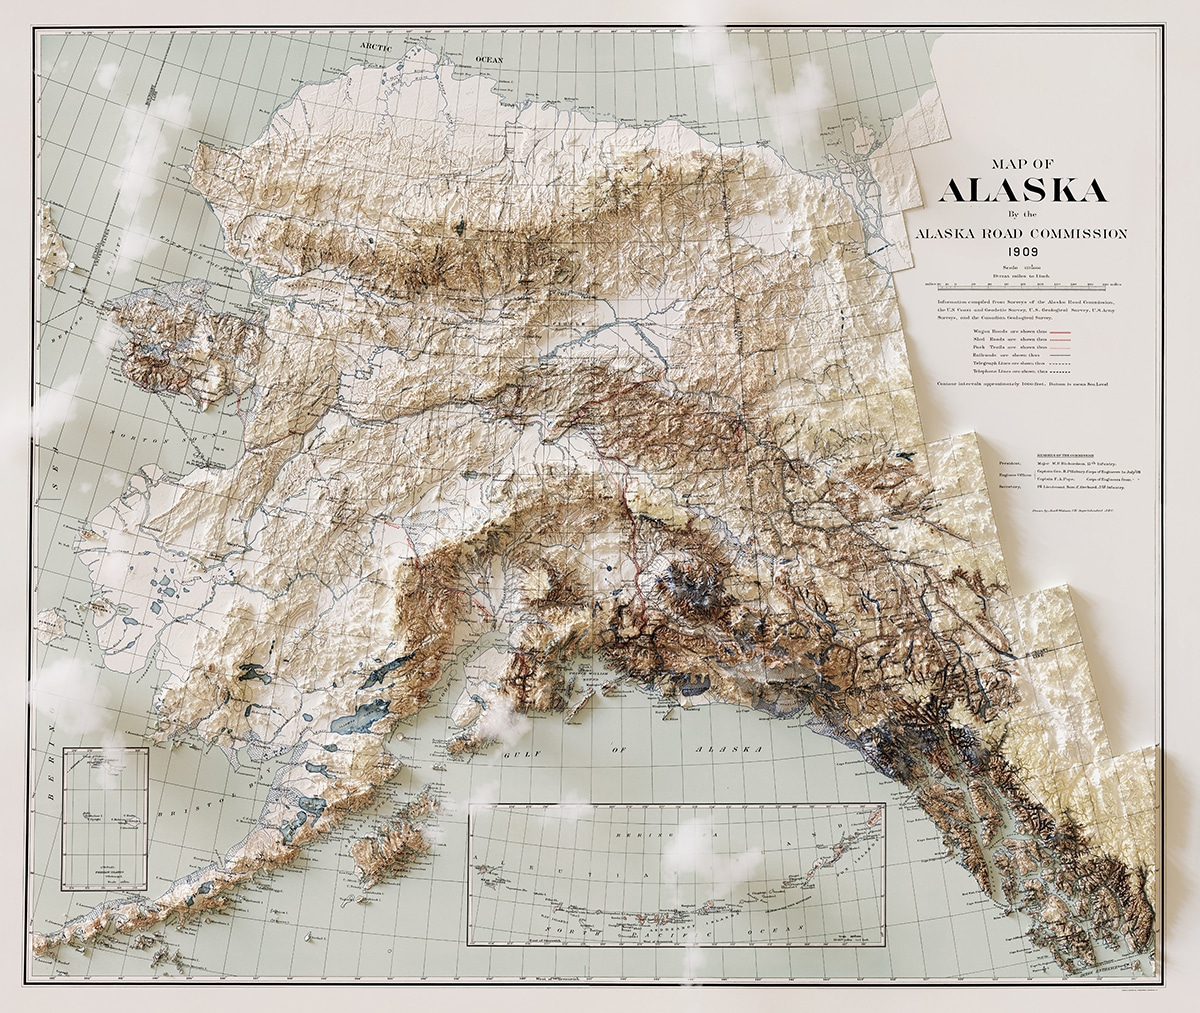 Carte des nuages de l'Alaska